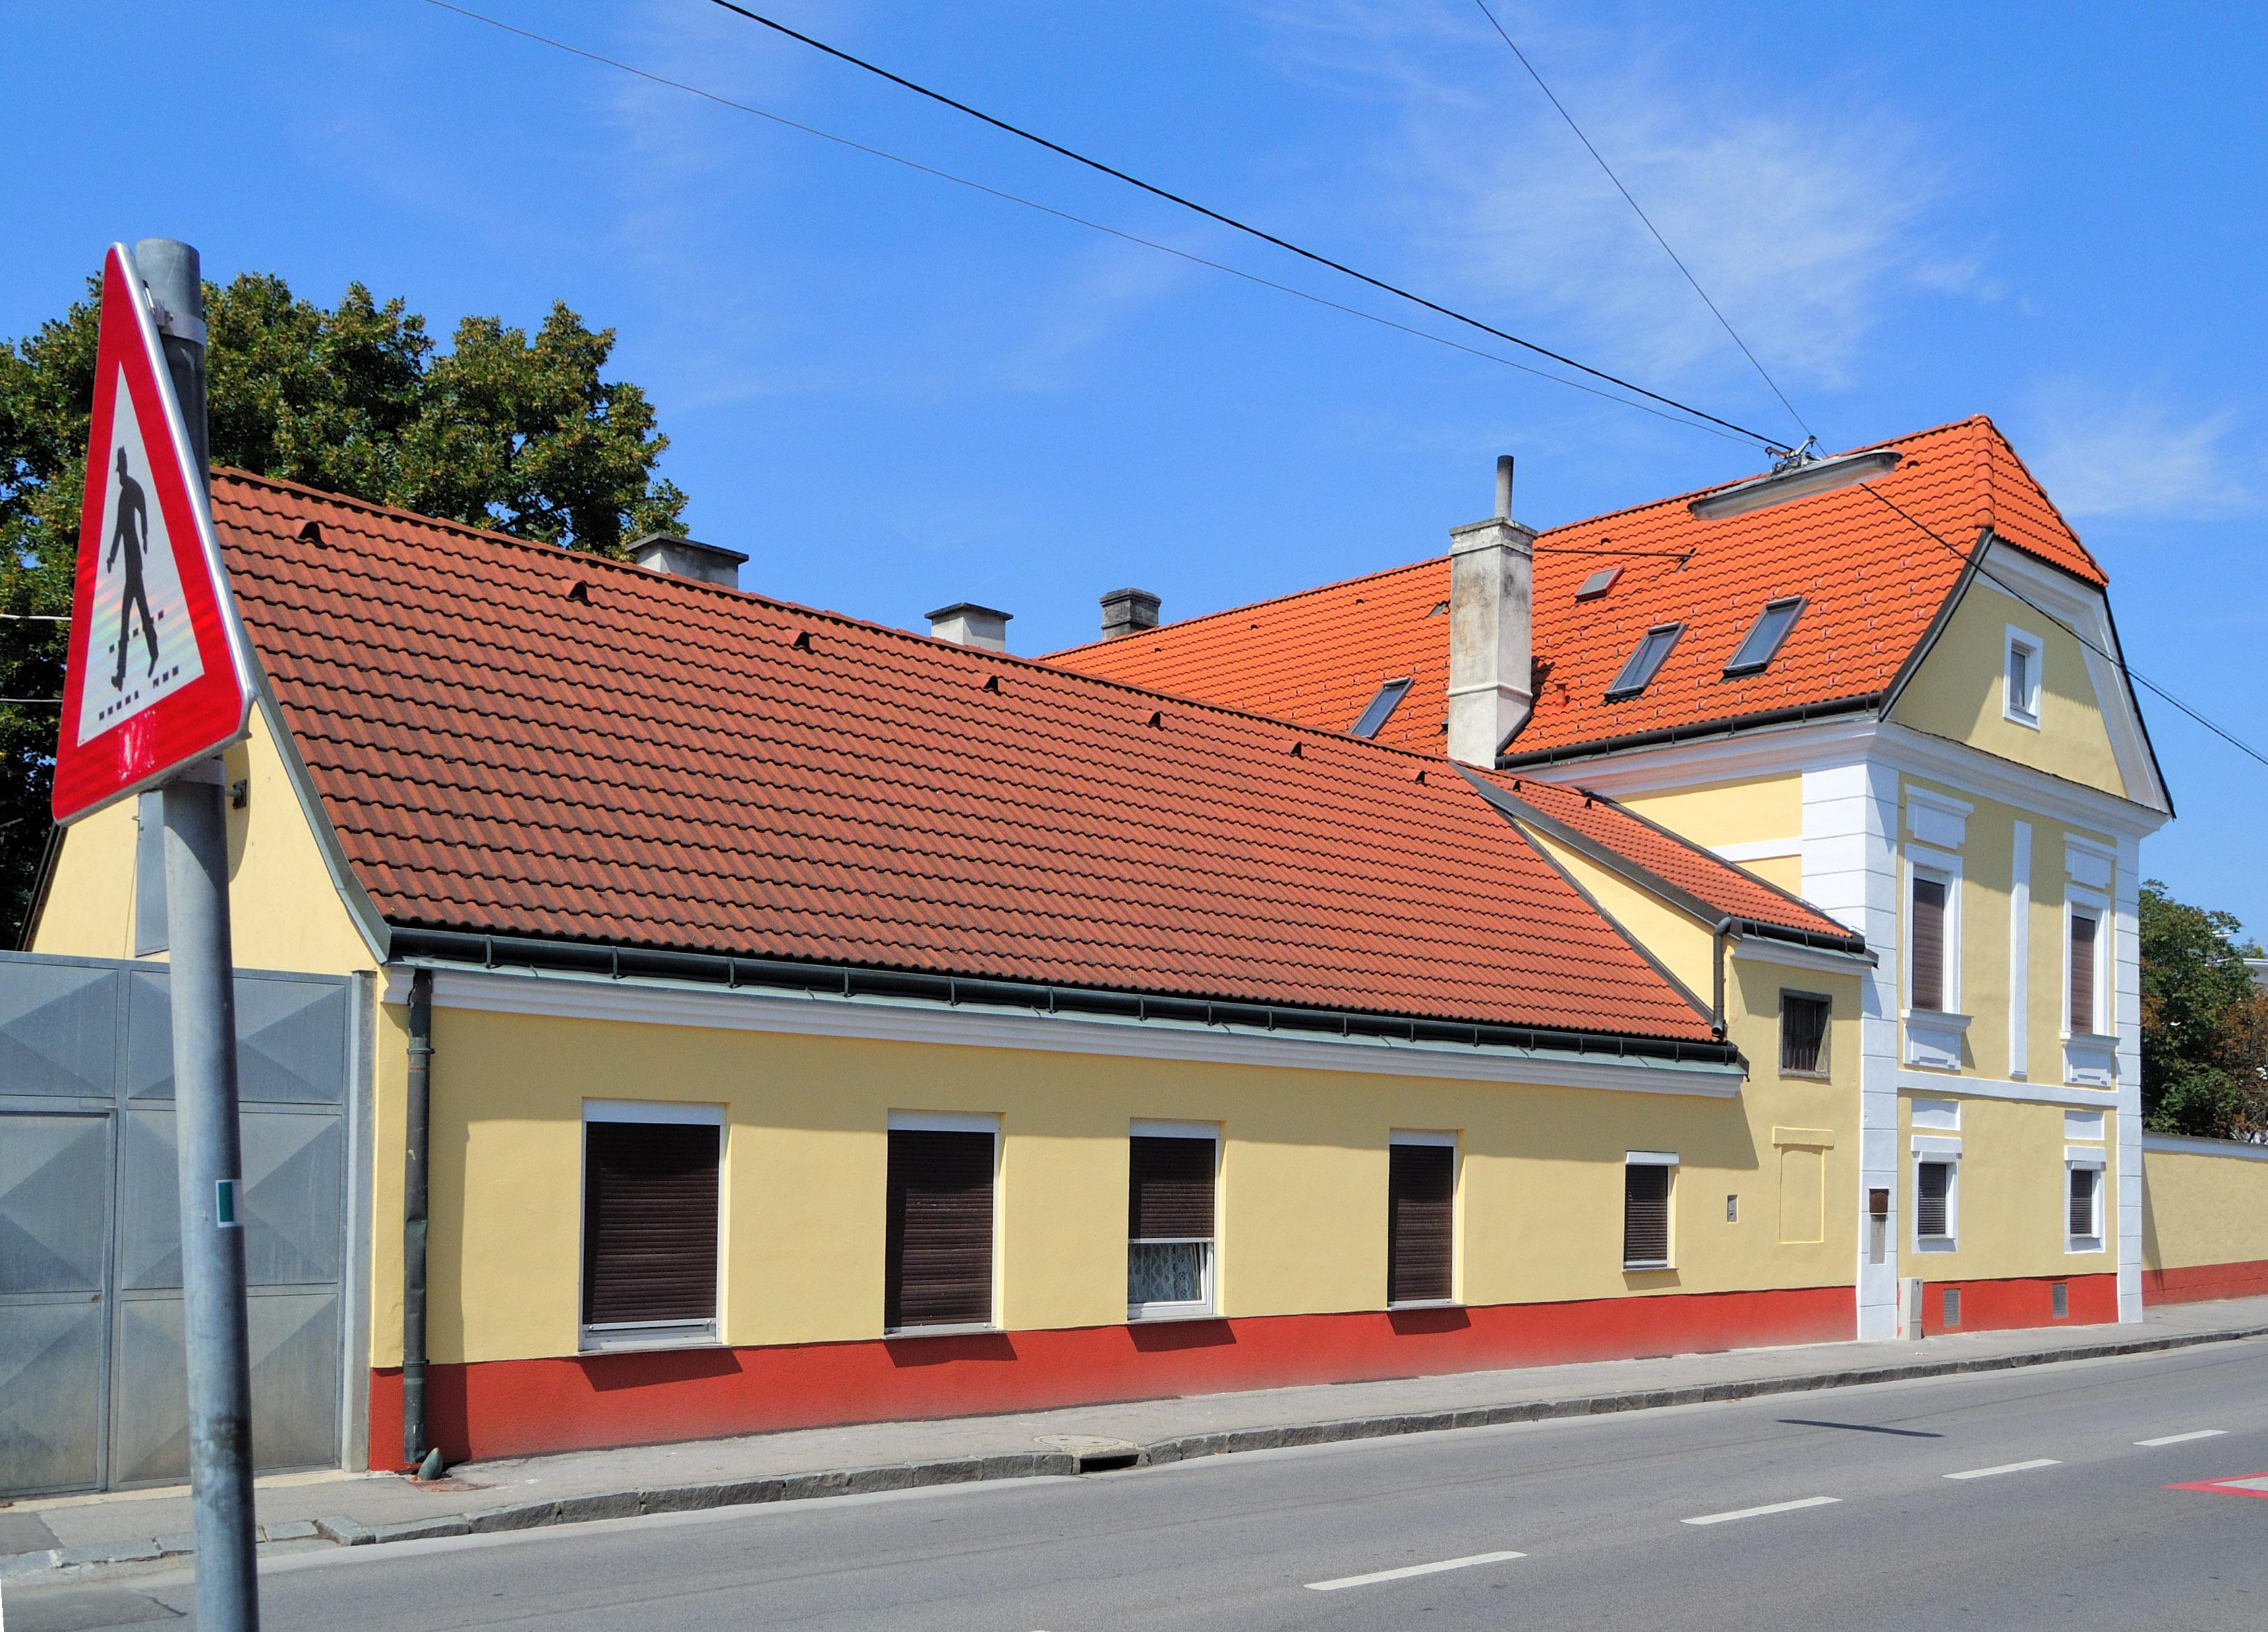 Swiss Dating Kostenlos Himberg Partnersuche